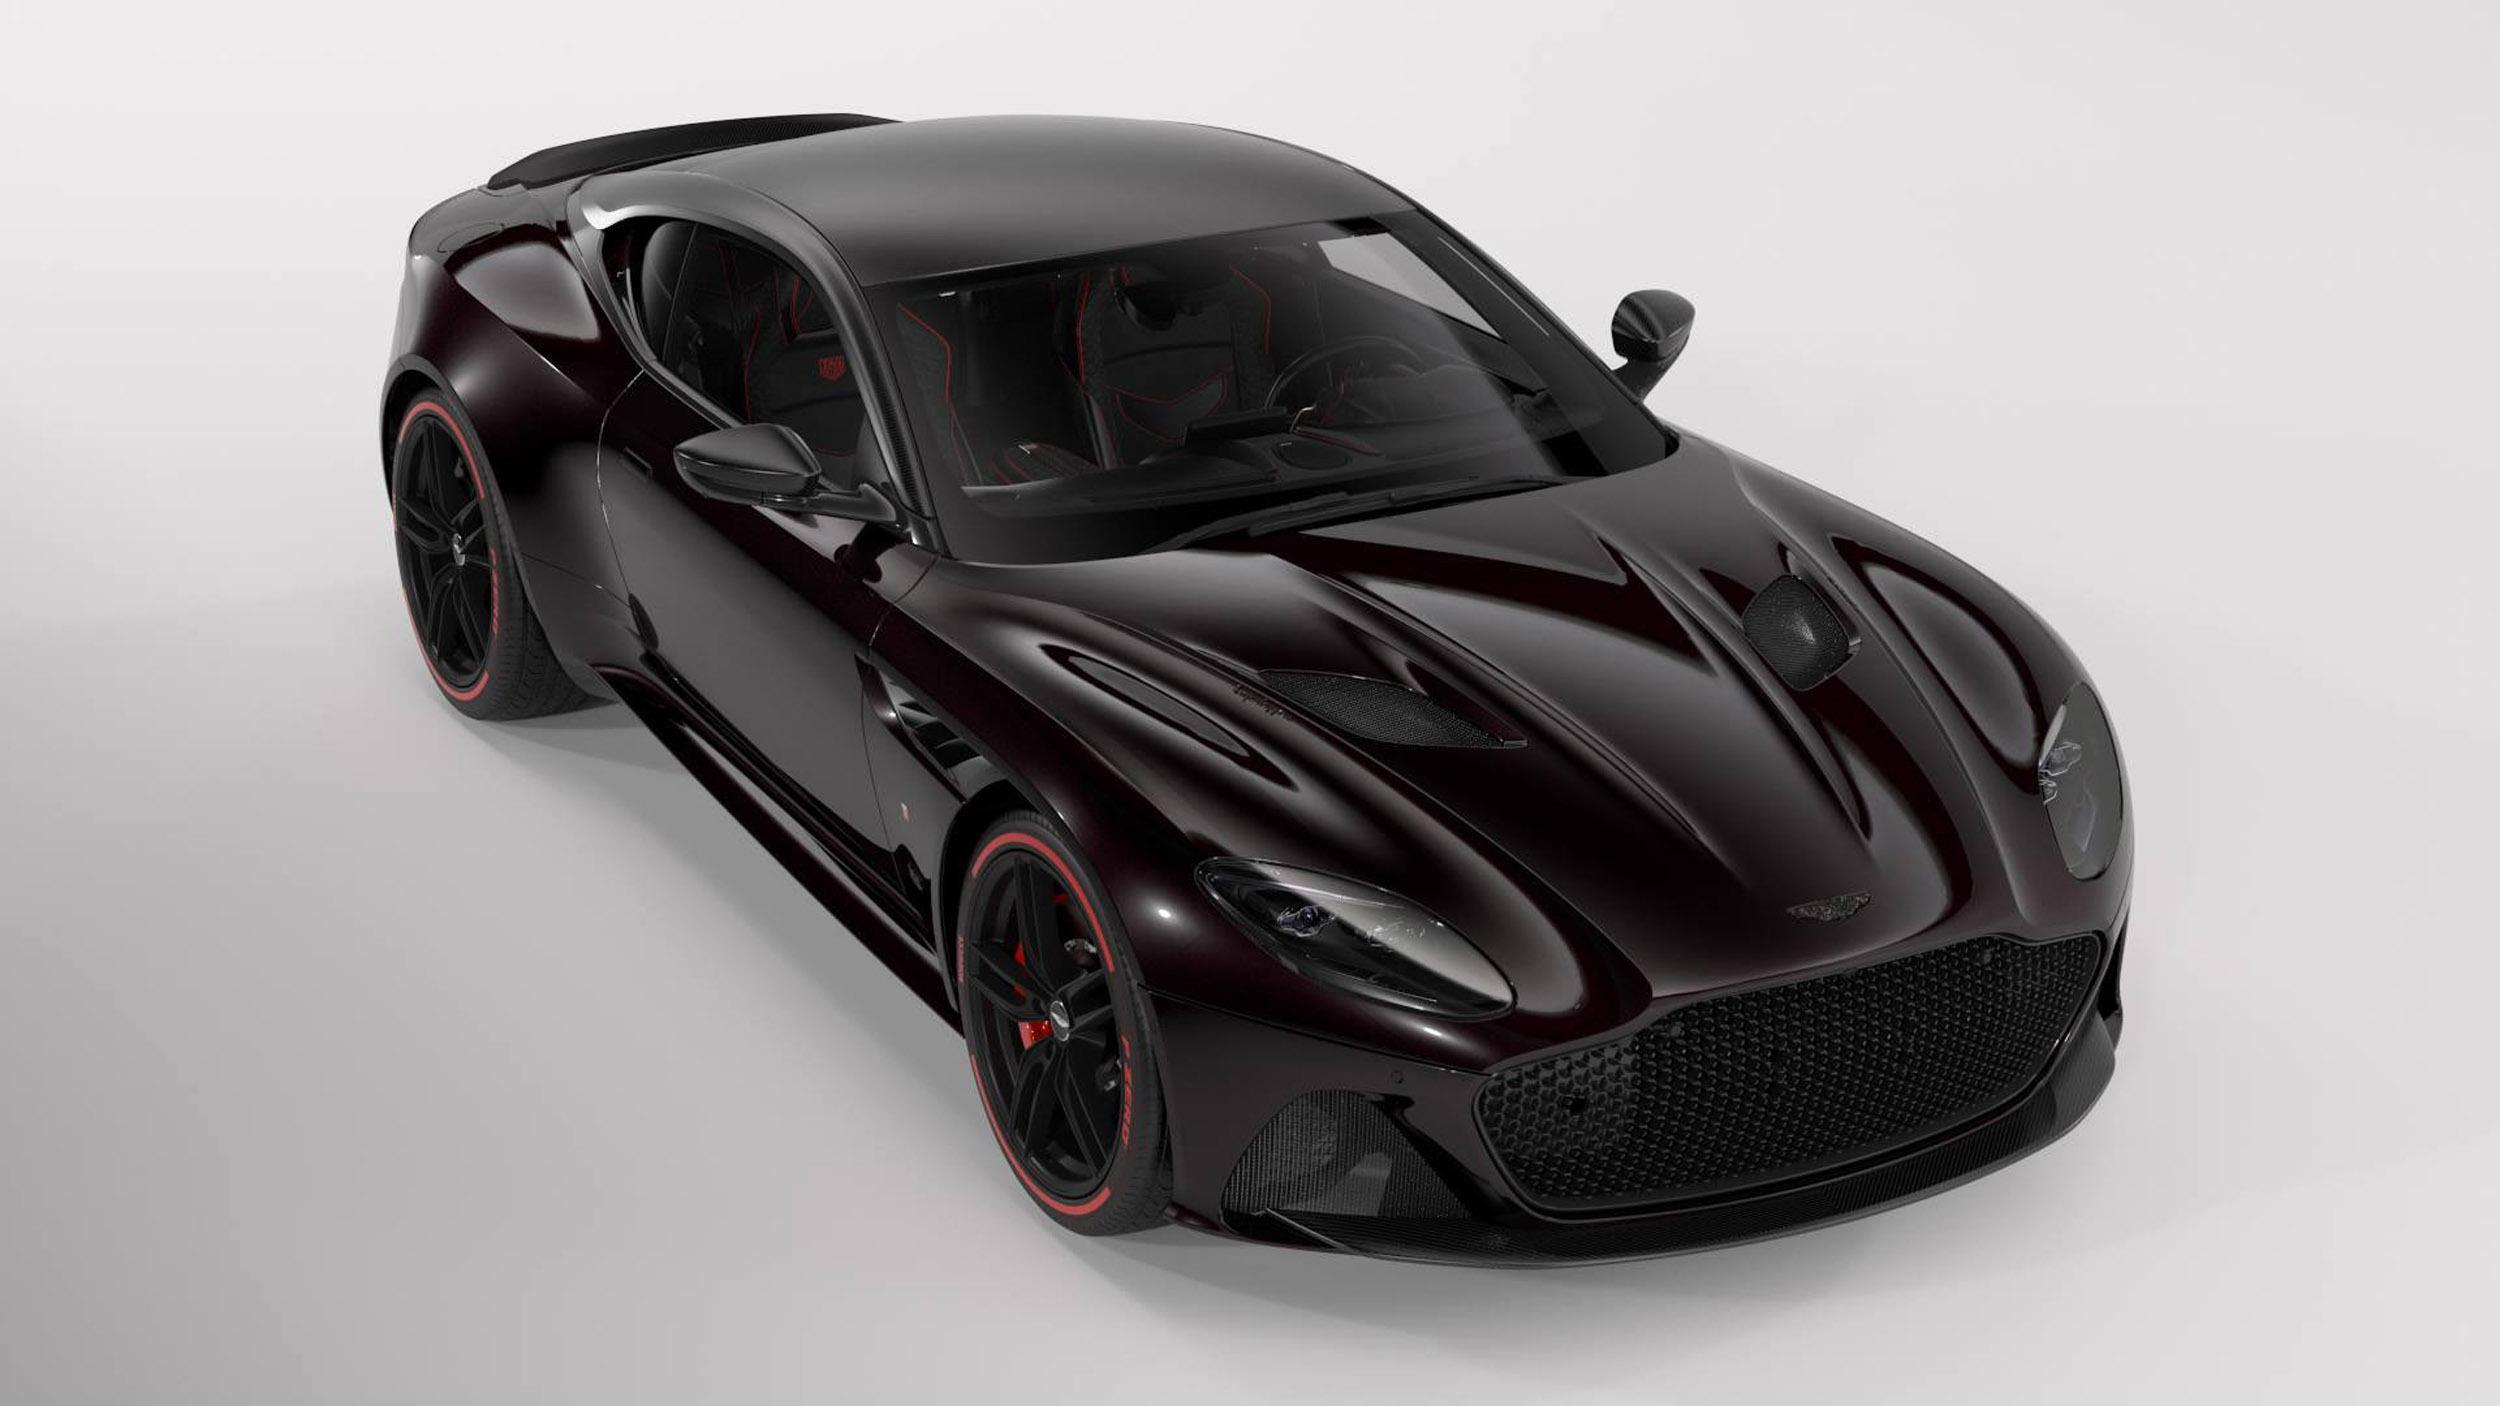 Aston Martin DBS Superleggera Tag Heuer Edition (1)